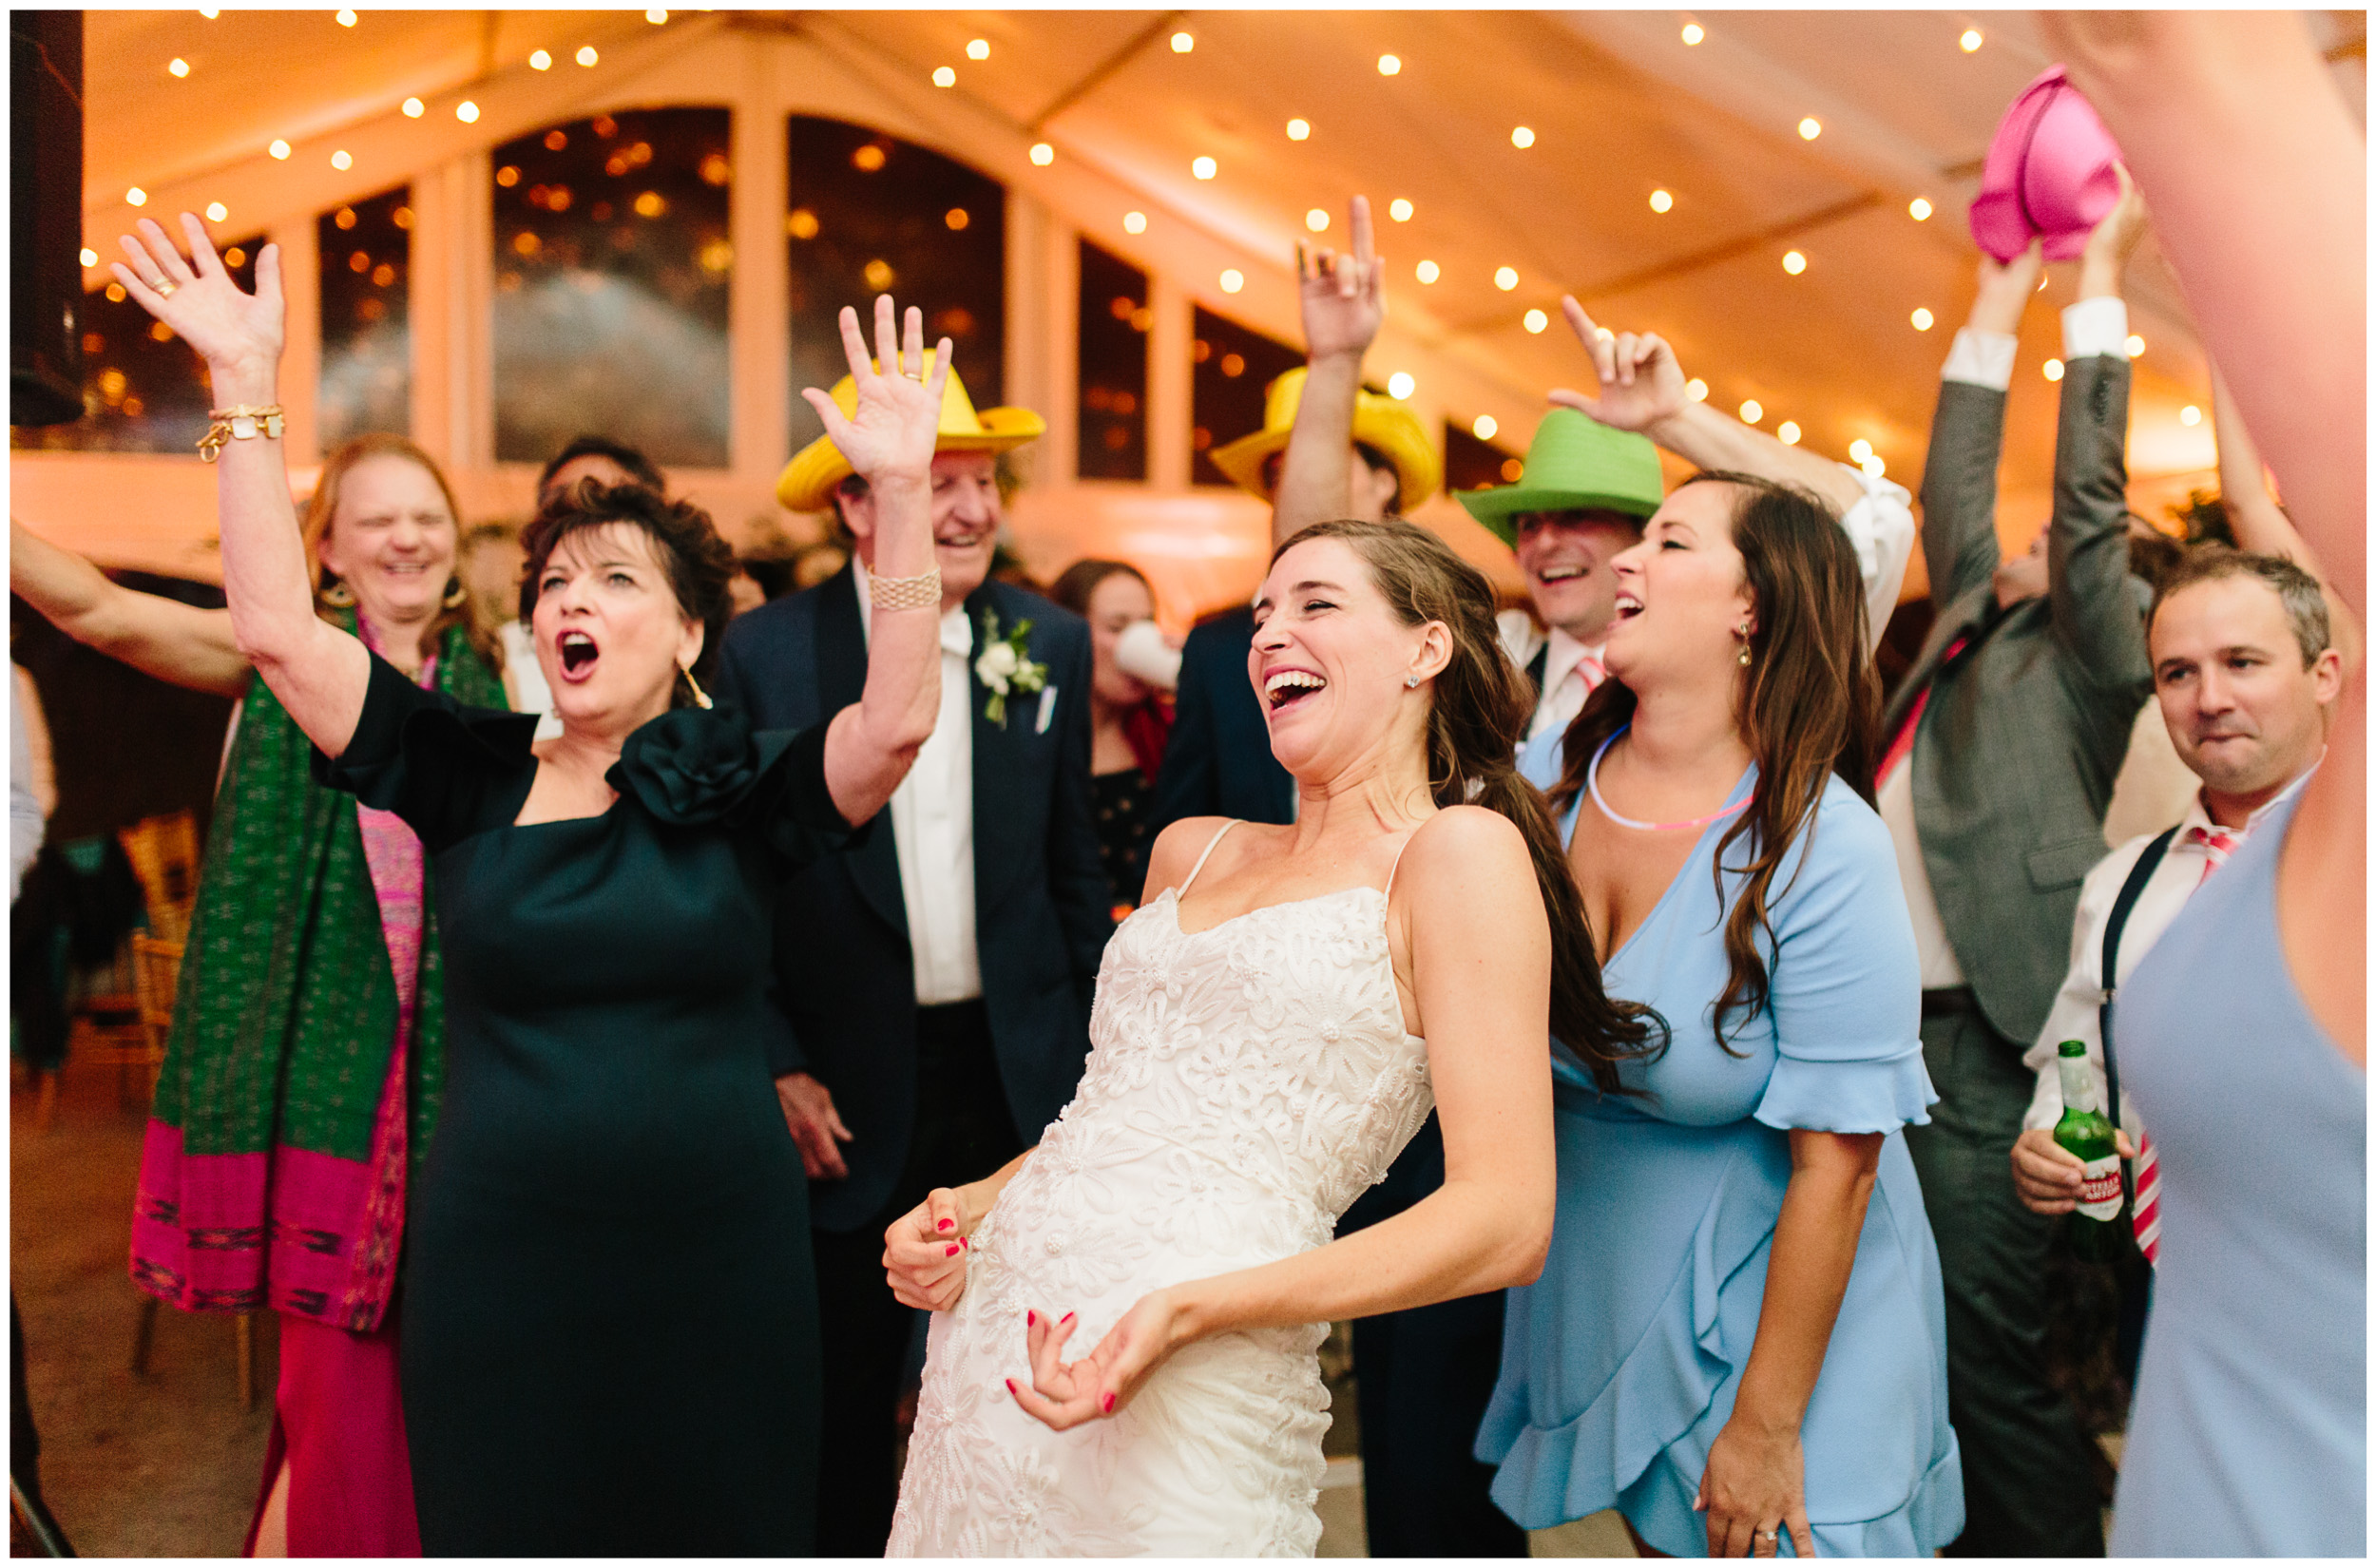 crested_butte_wedding_140.jpg